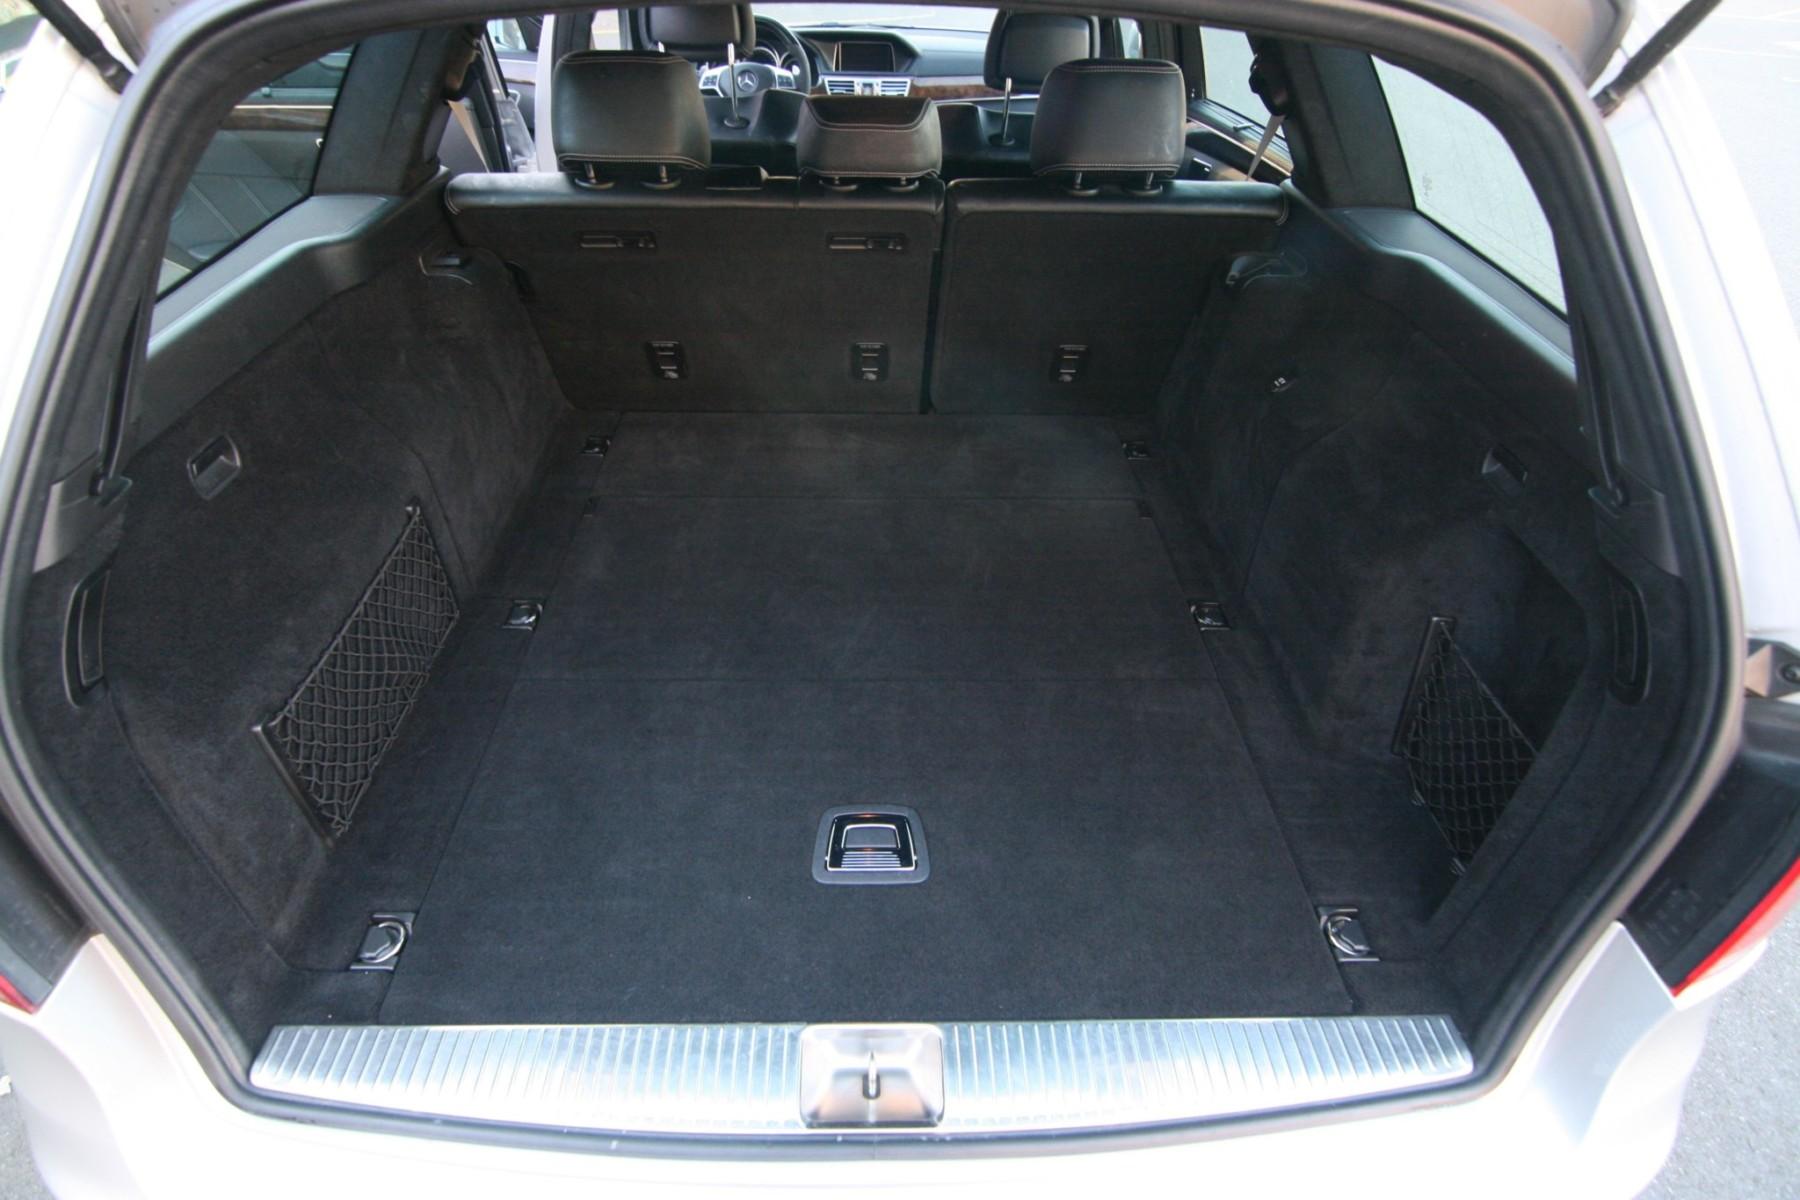 Mercedes-Benz E63 S AMG 4MATIC Wagon 9